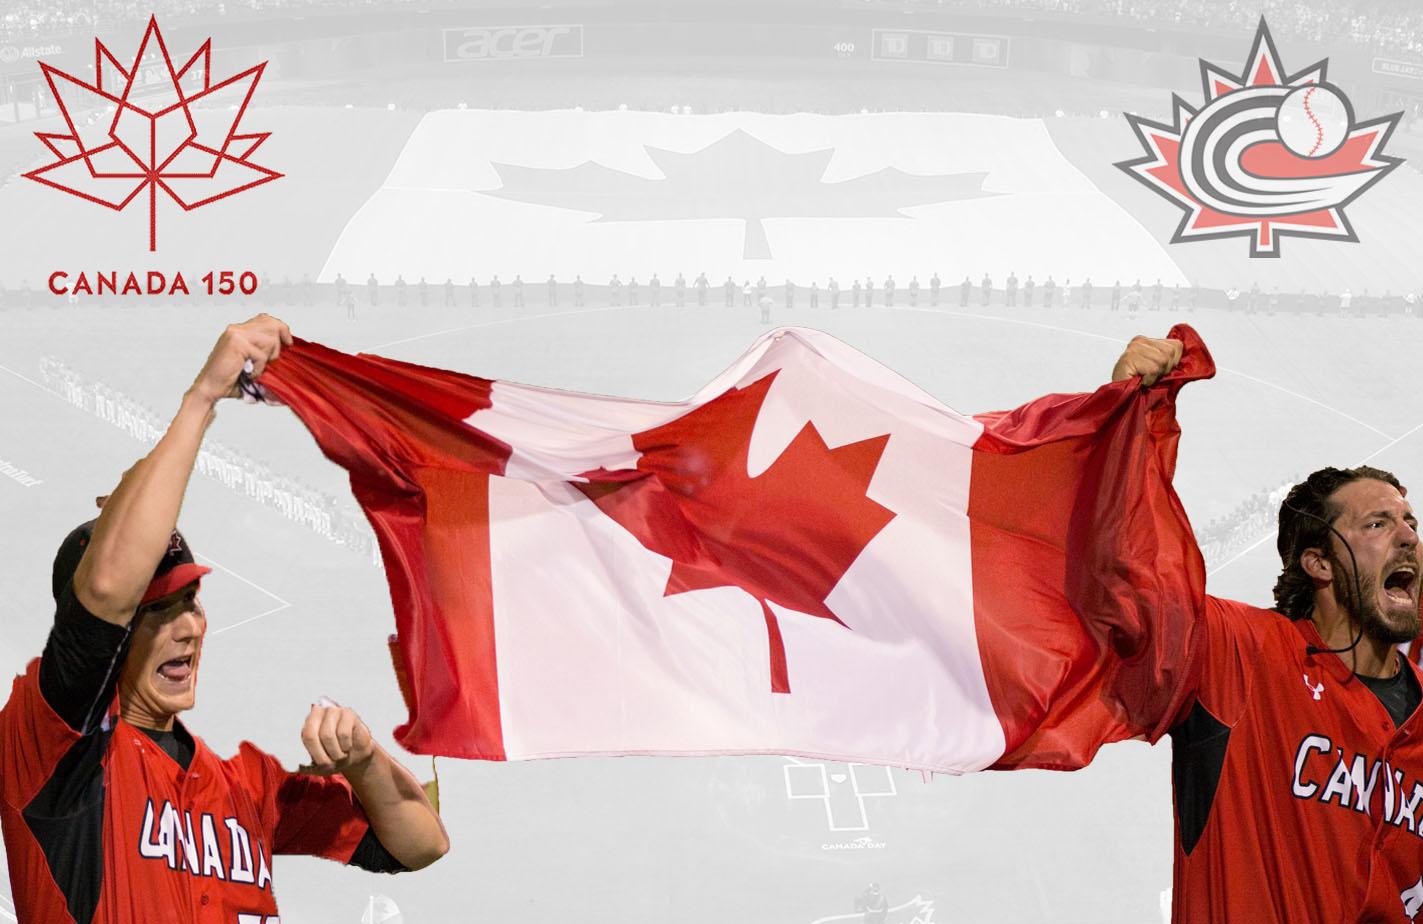 HAPPY 150TH, CANADA!